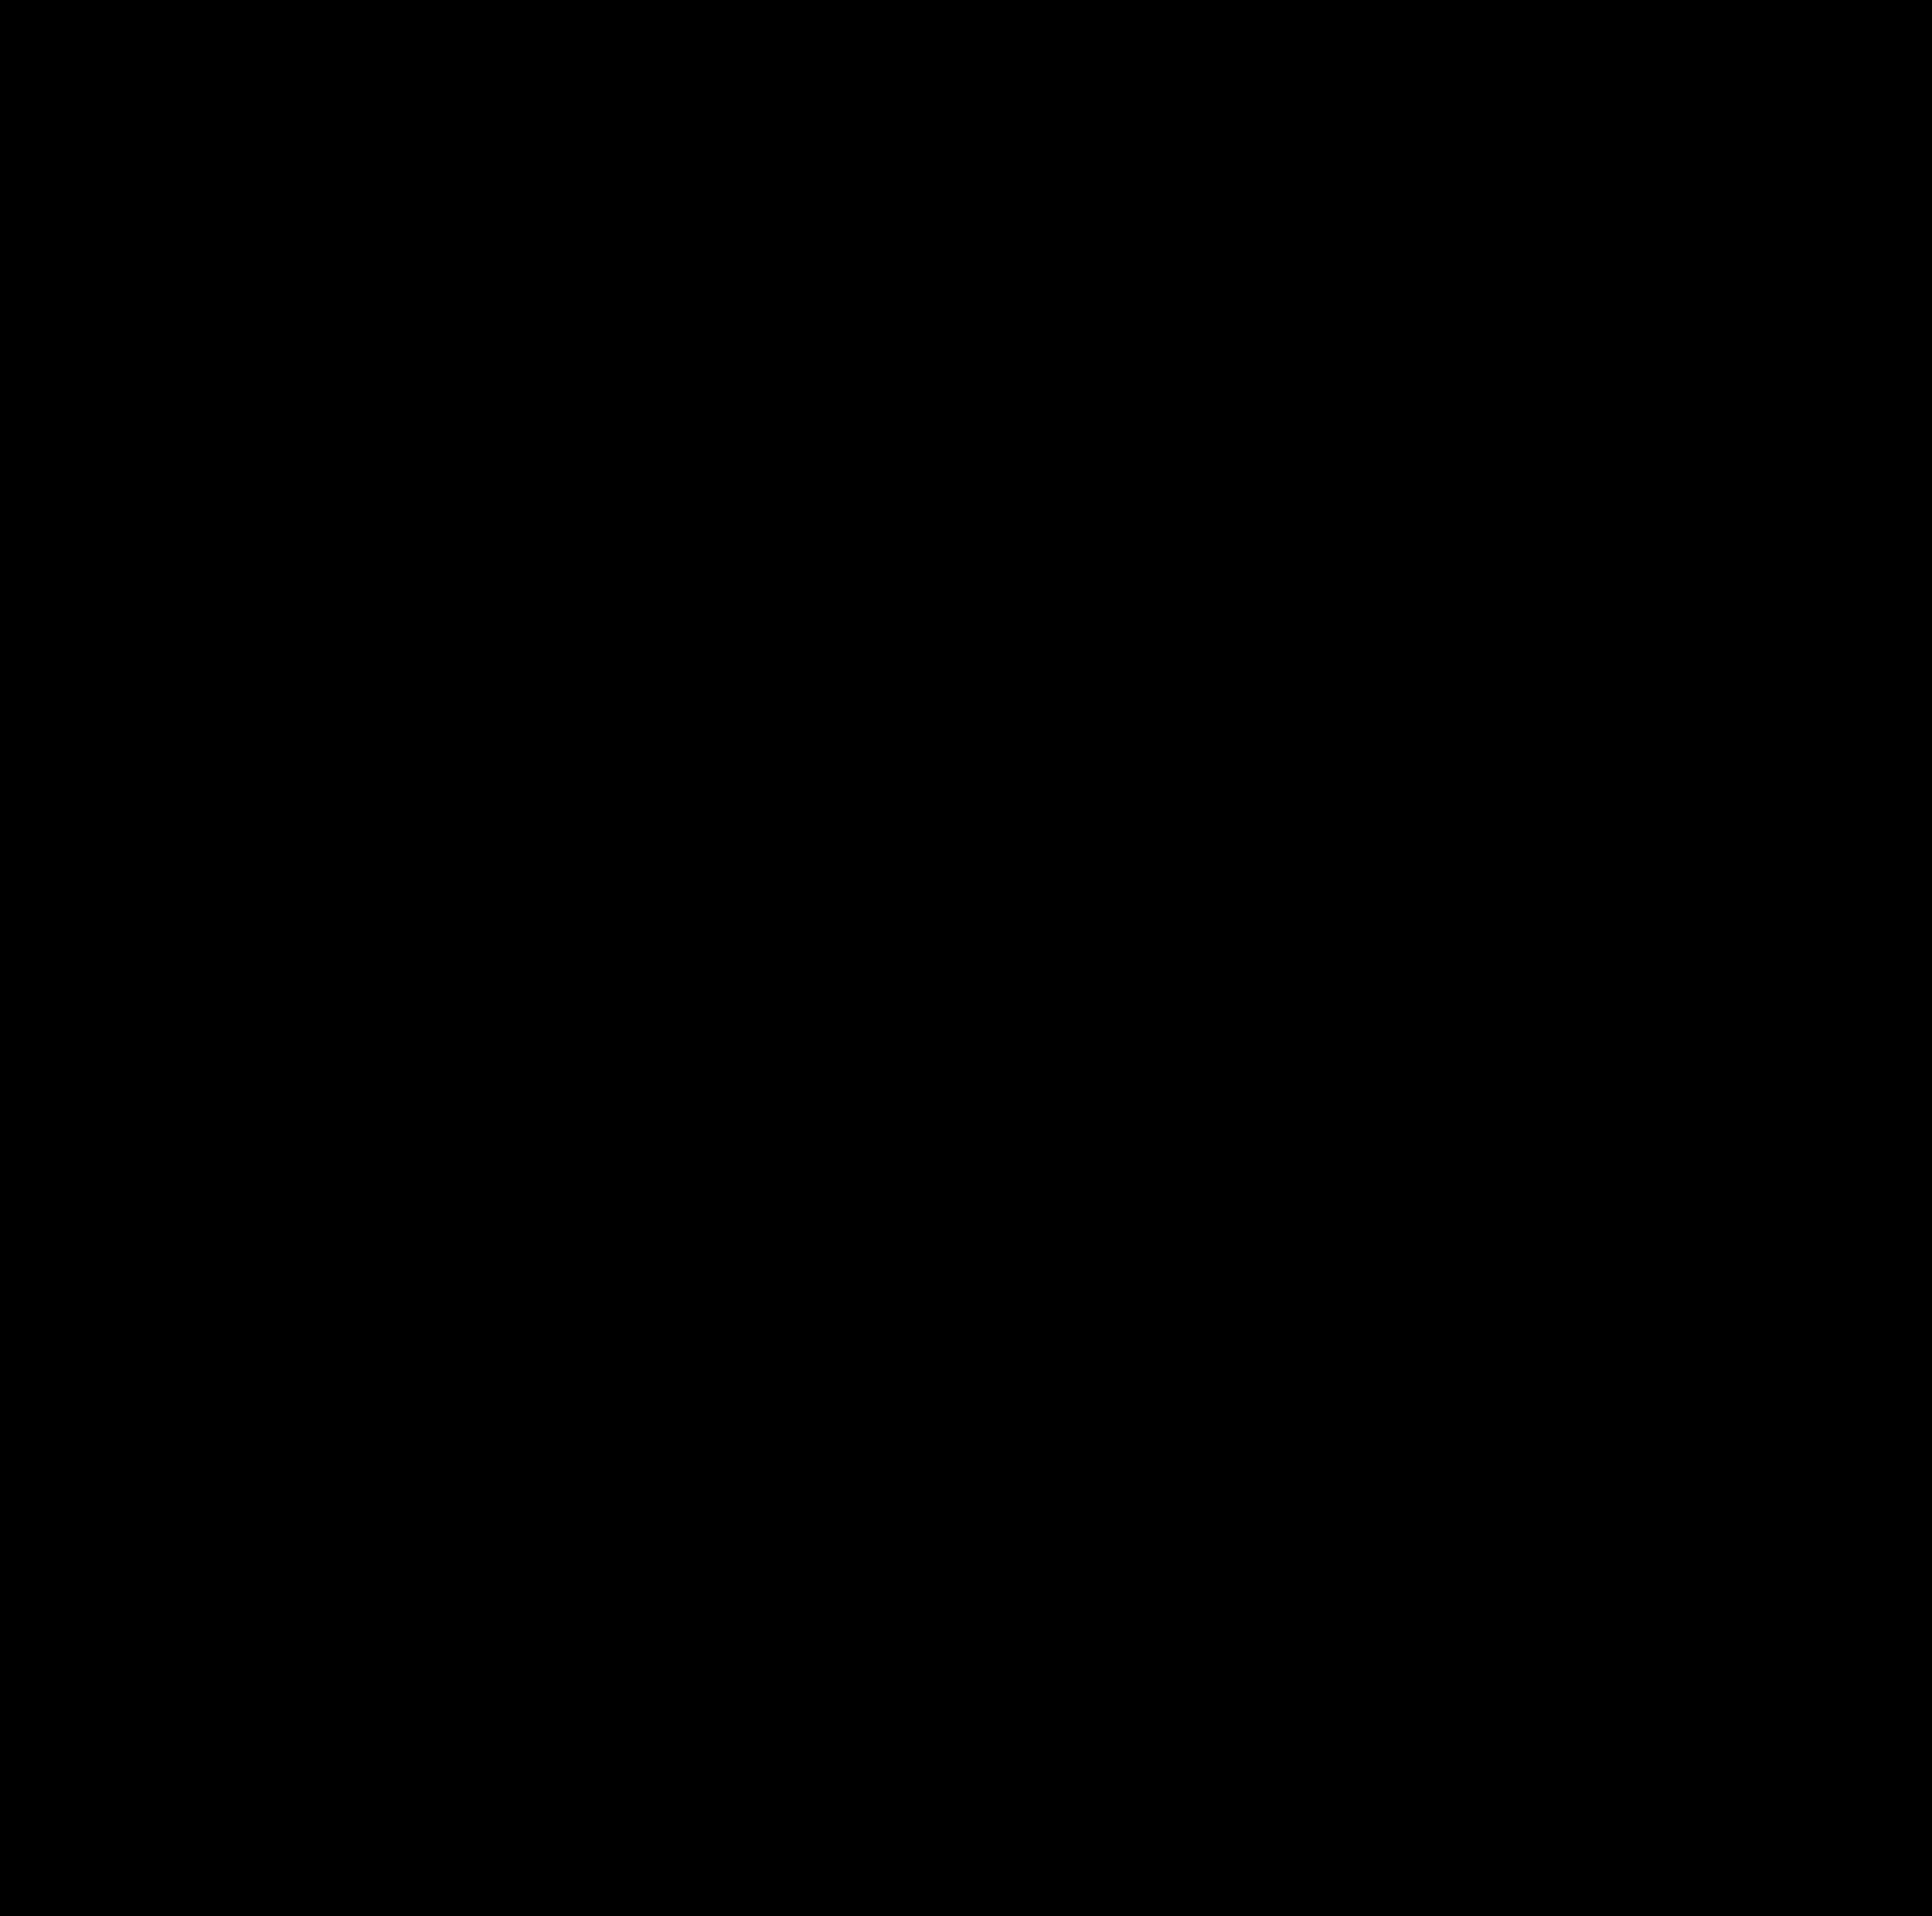 clip art black and white symbol transparent cool #116162386